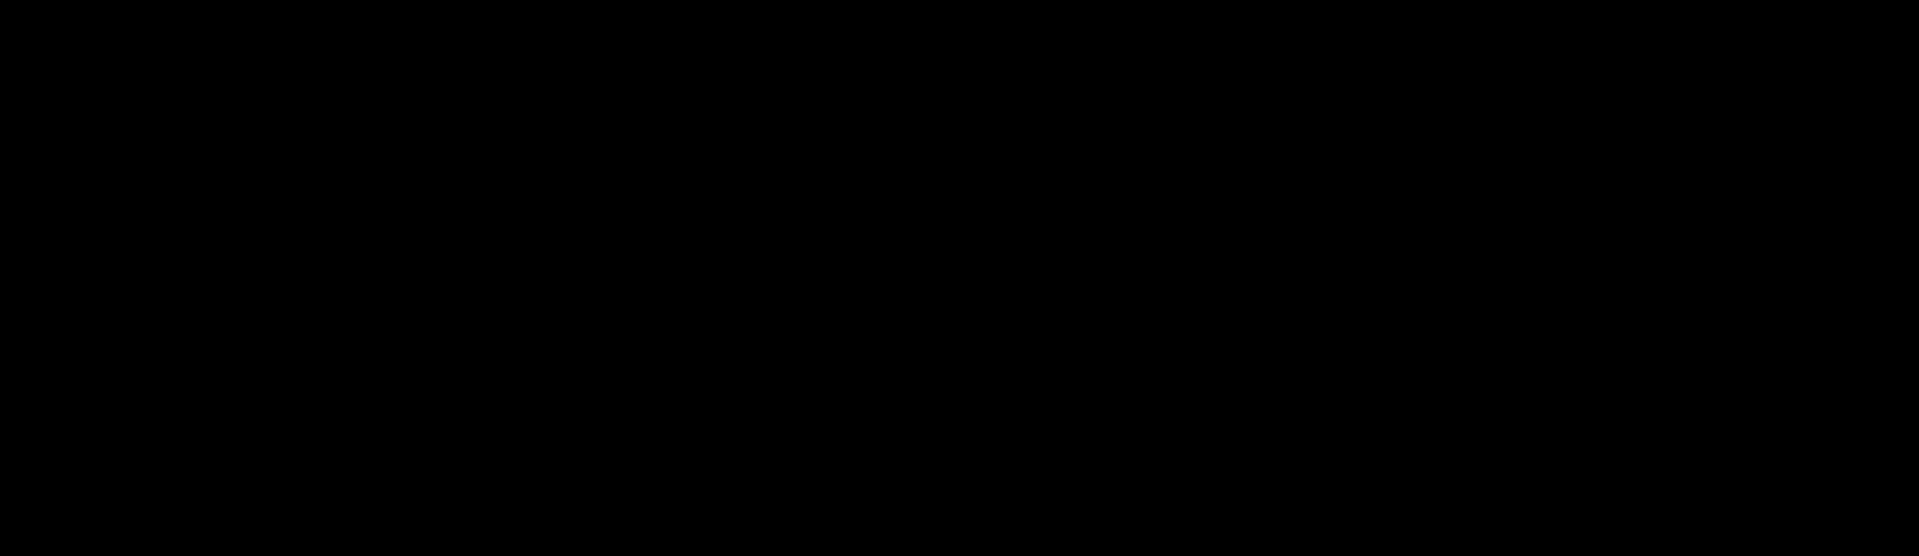 Black Gradient-01.png